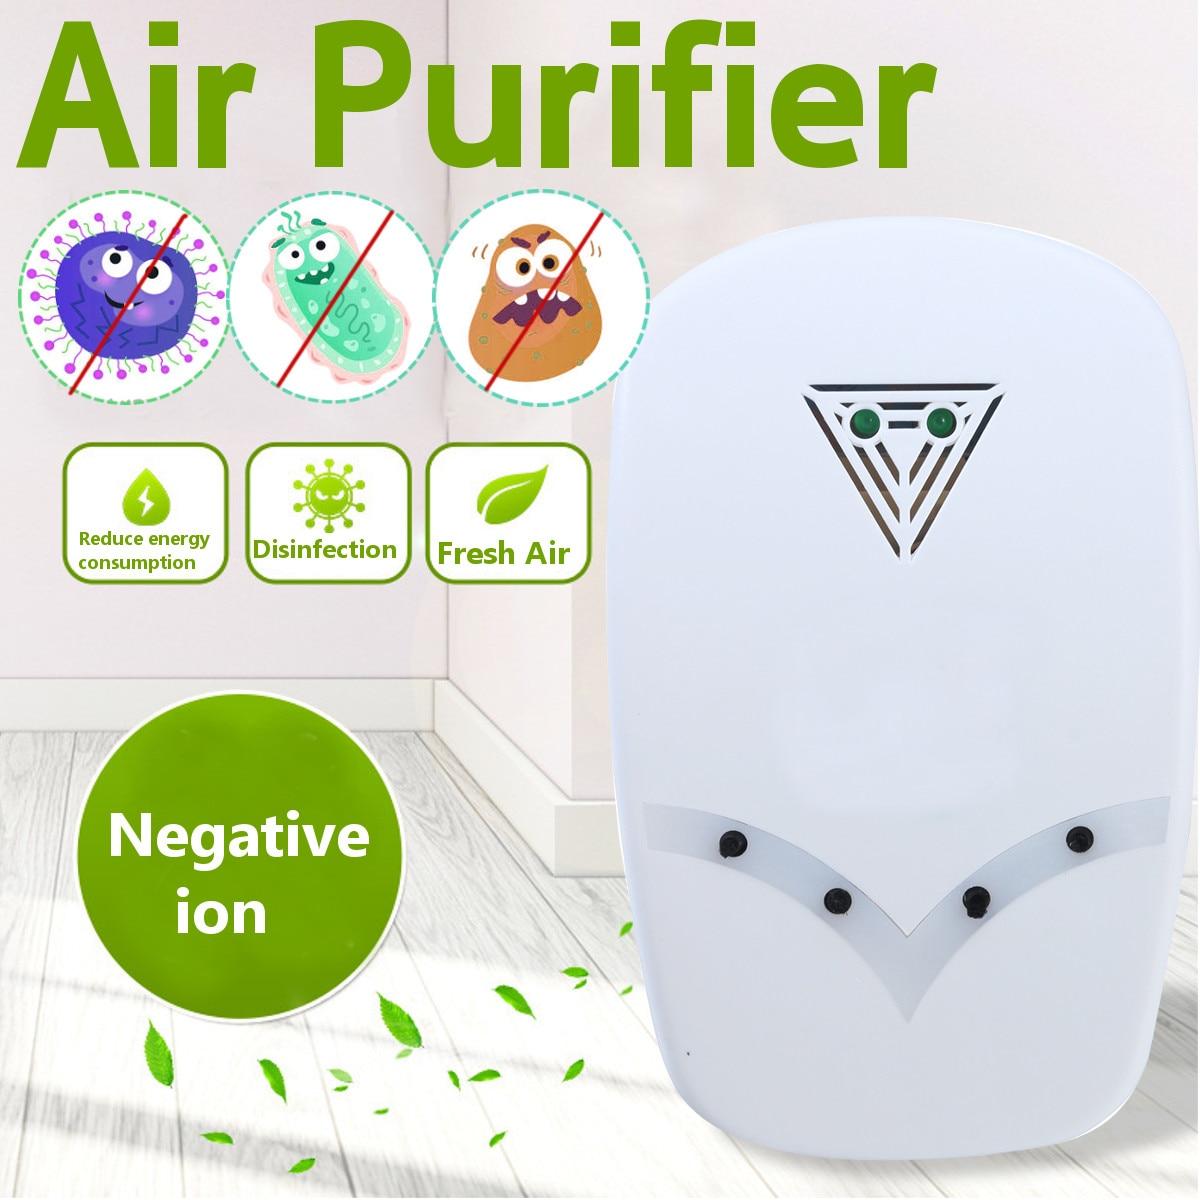 Ozone Generator 220V Anion Sterilizer Air Purifier Home Deodorizer Purification Smoke Formaldehyde Odor Filter Disinfect